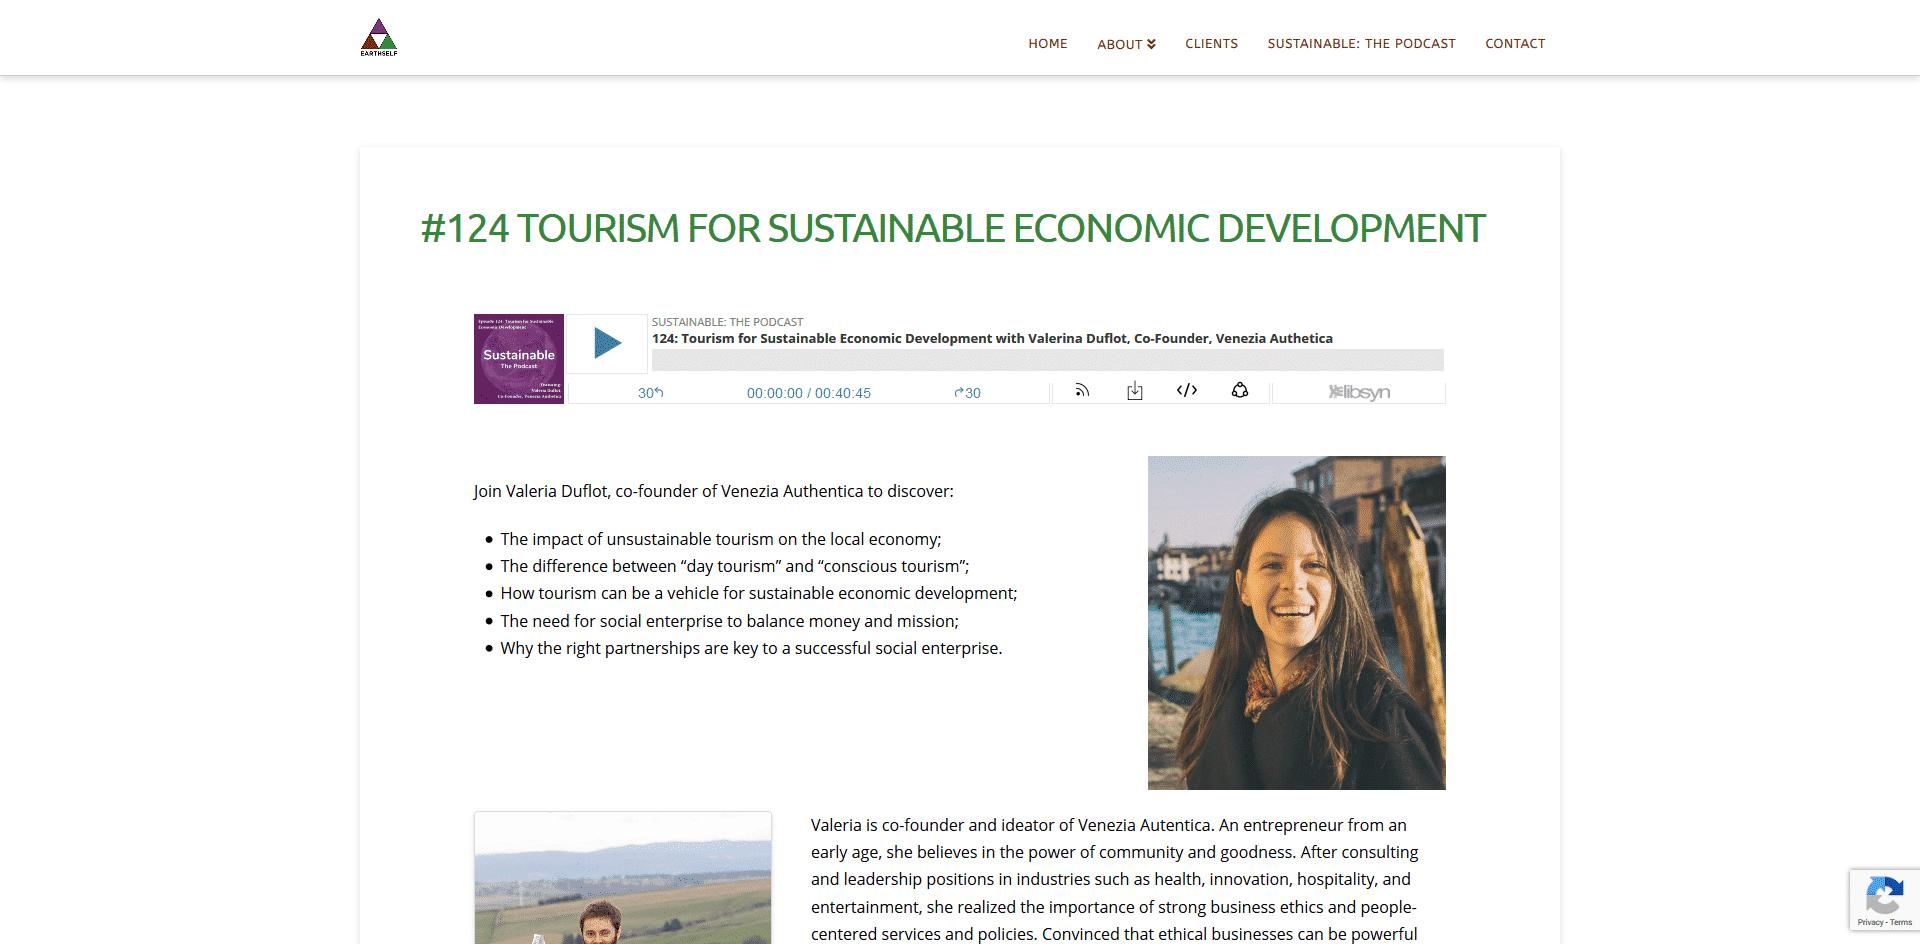 Sustainable: The Podcast Interviews Valeria Duflot of Venezia Autentica - Venezia Autentica | Discover and Support the Authentic Venice -